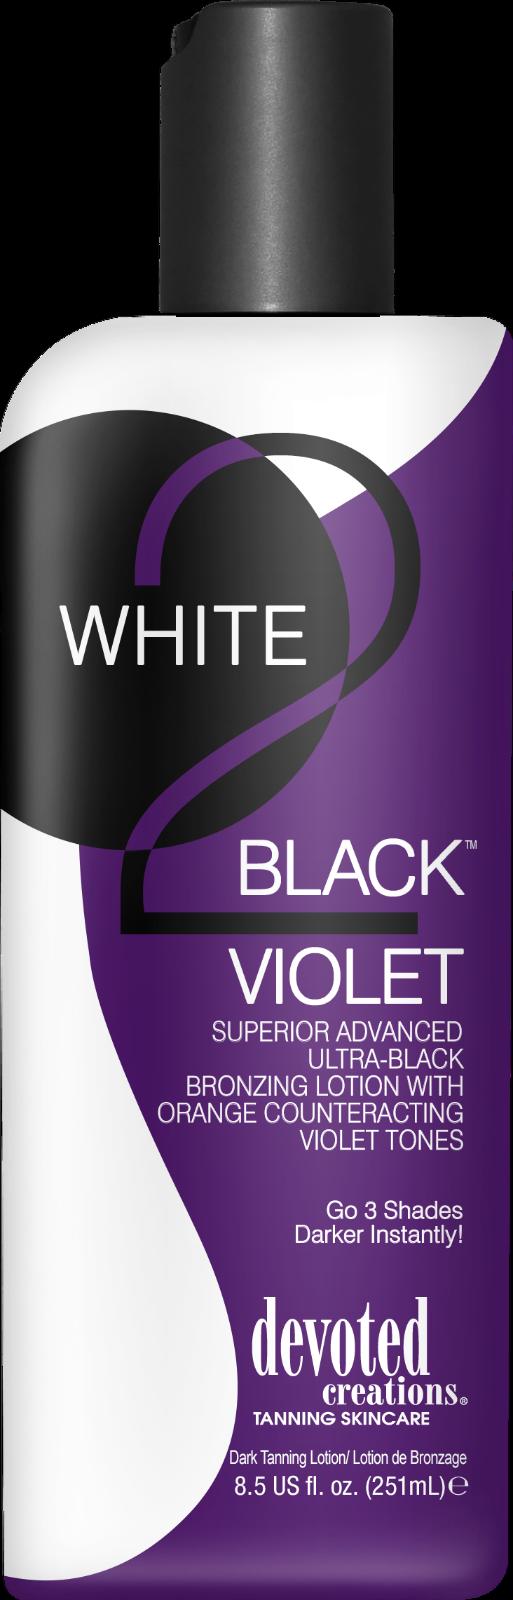 WHITE 2 BLACK VIOLET BRONZER 8.5OZ DEVOTED CREATIONS U-PICK